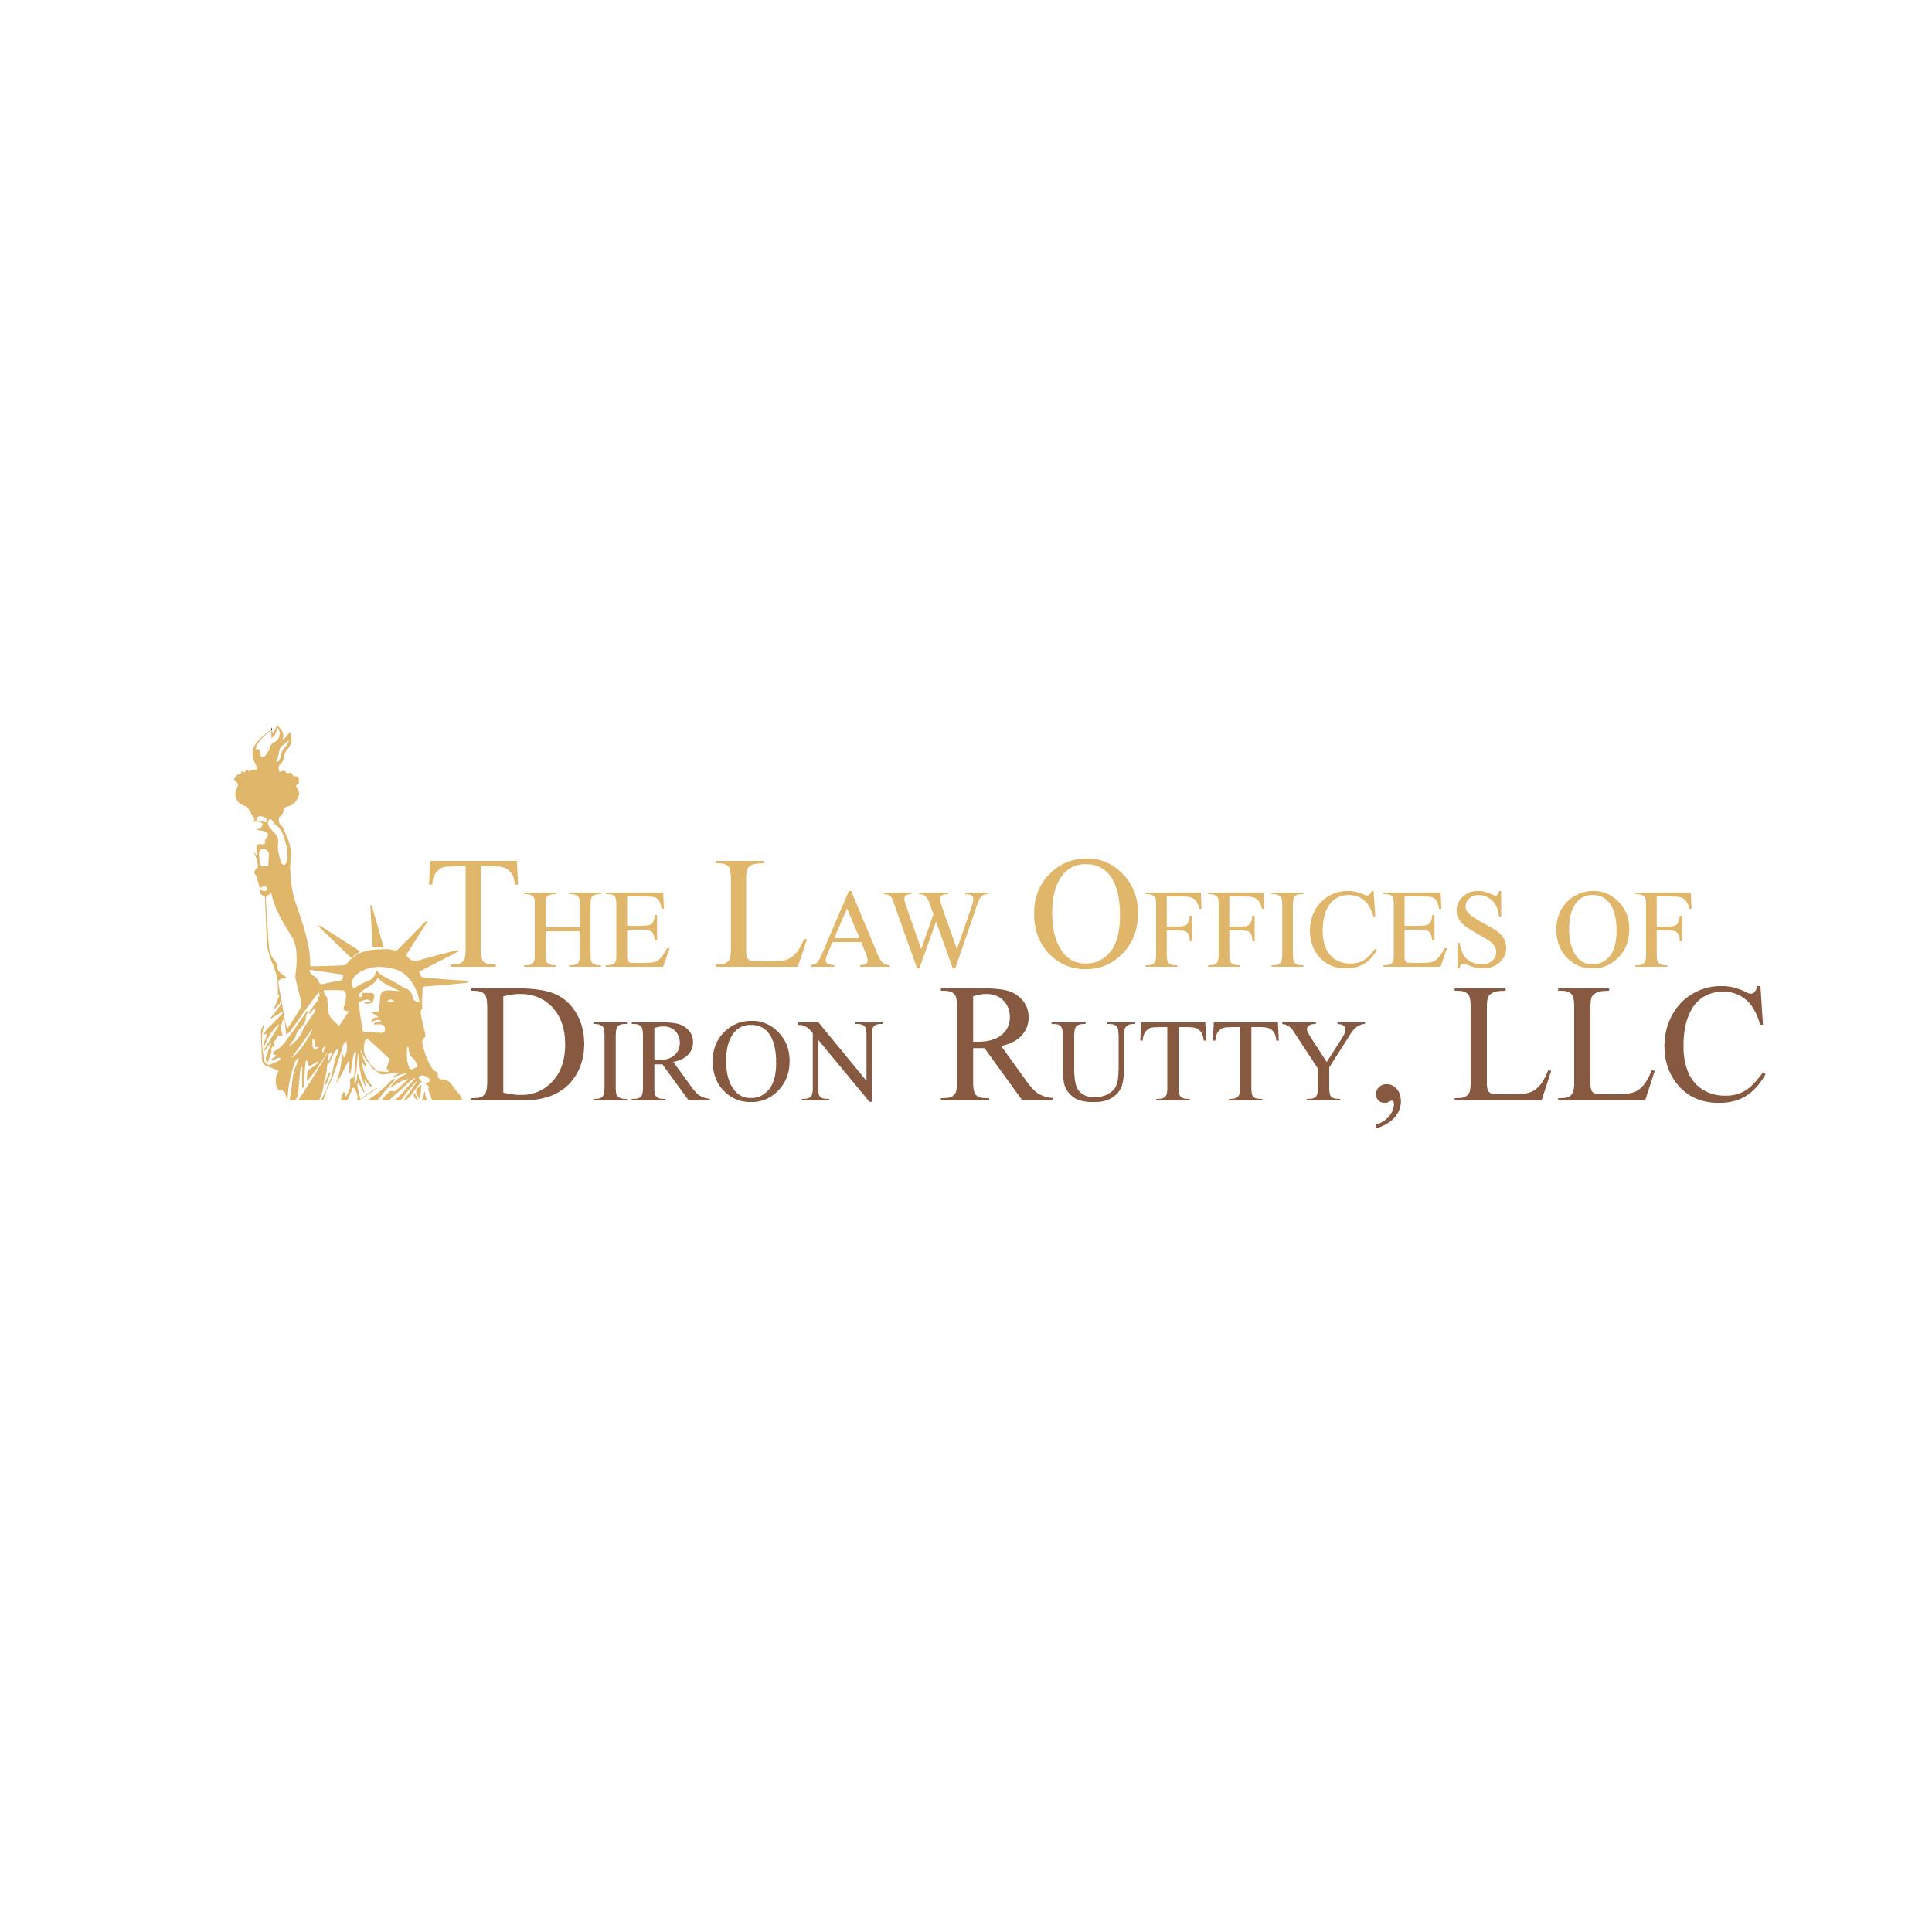 Diron Rutty LLC